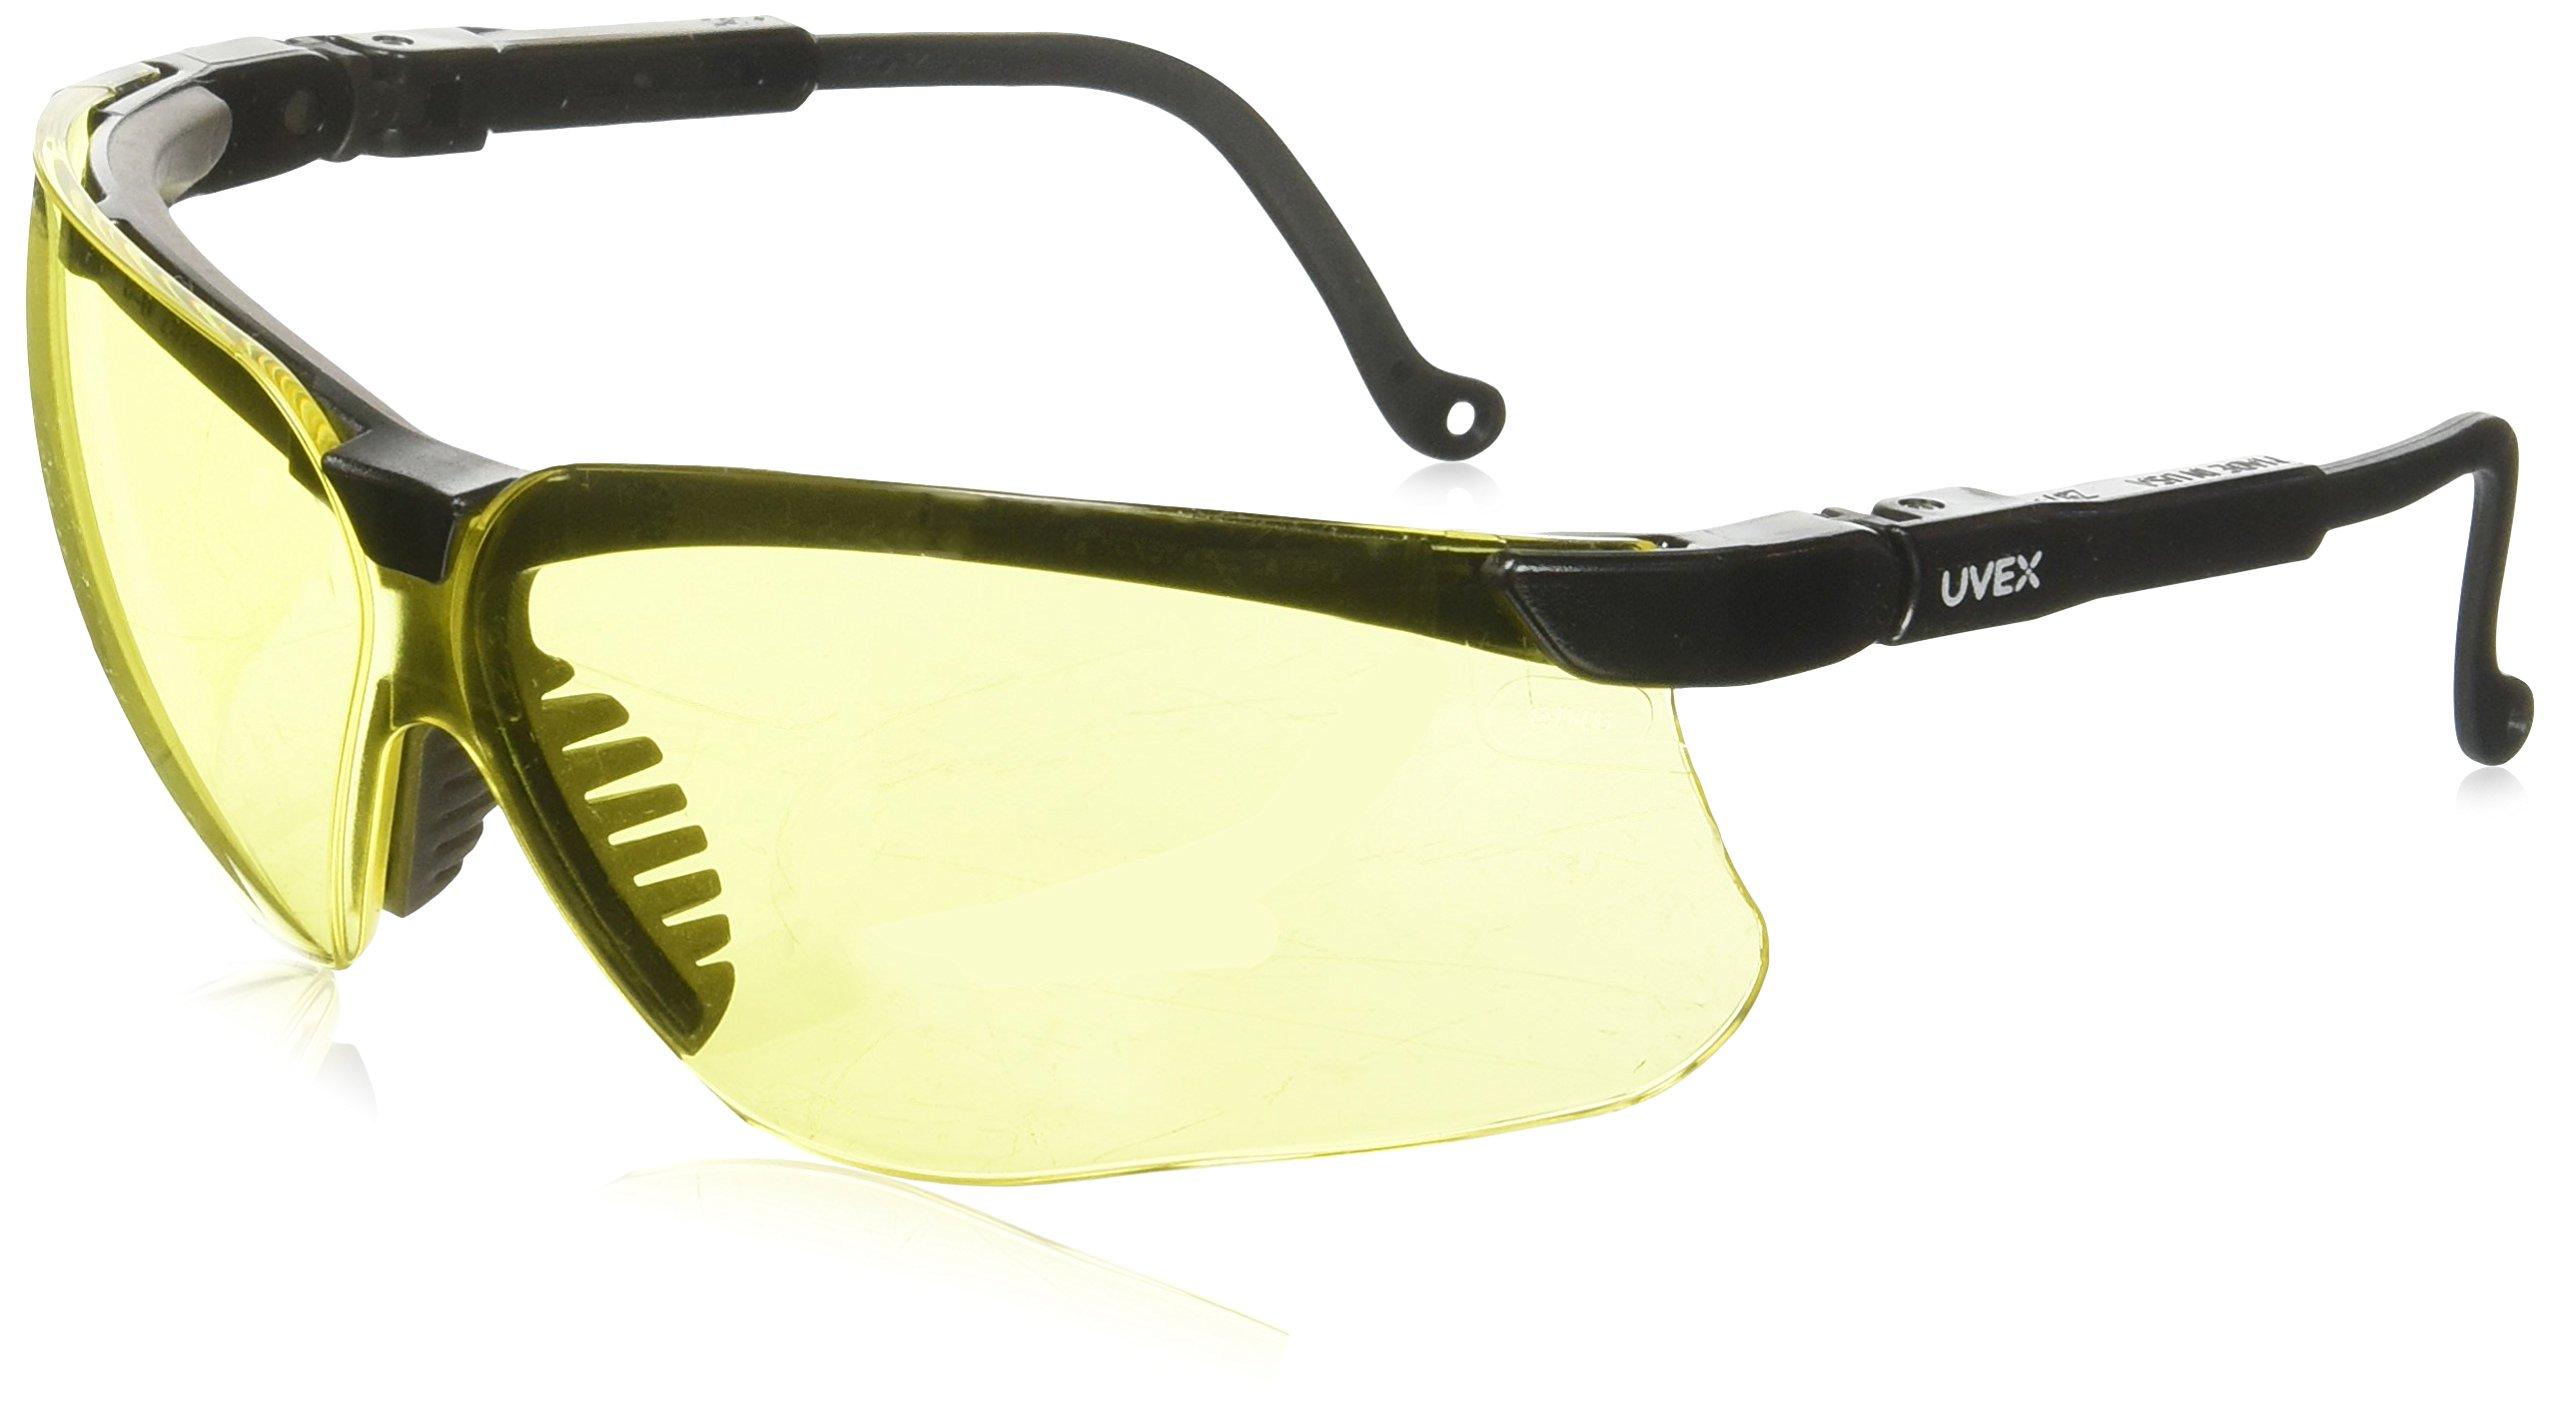 Honeywell Home Uvex S3202 Genesis Safety Eyewear, Black Frame, Amber Ultra-Dura Hardcoat Lens